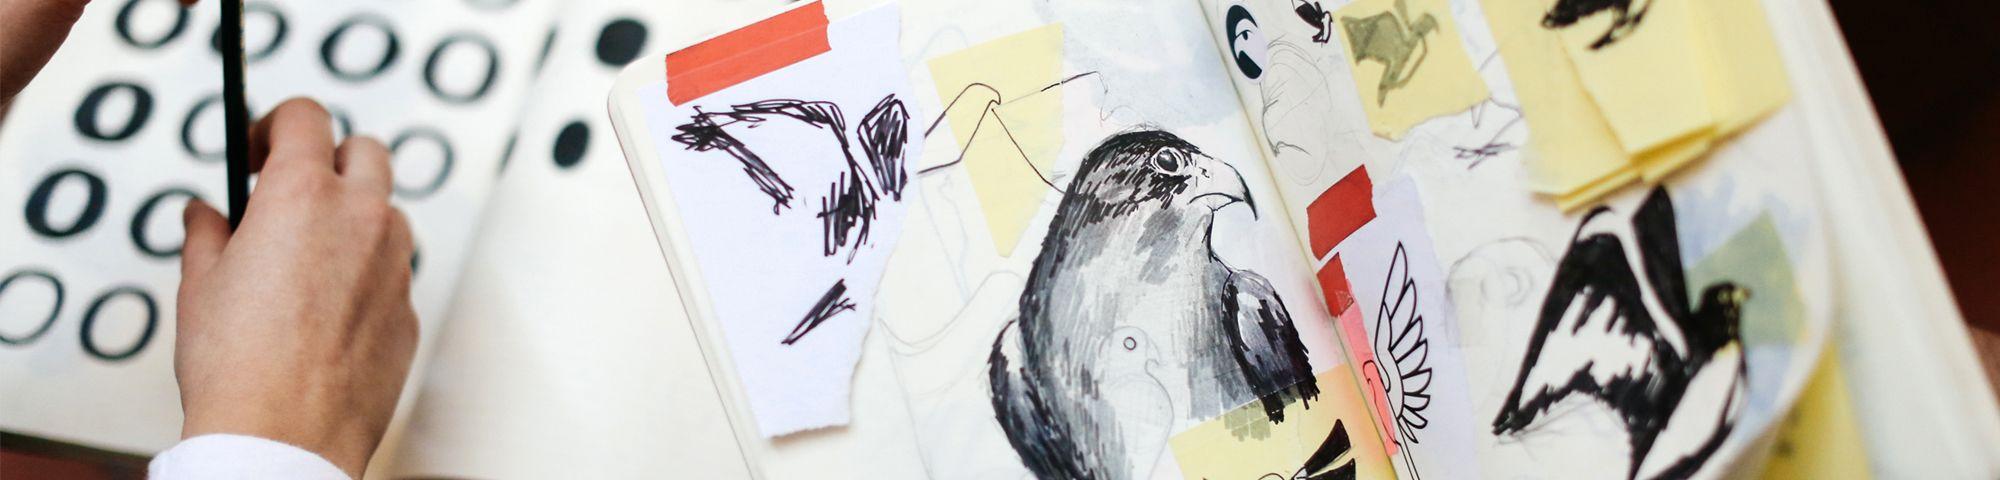 Sketchbook by Miguel Desport and Marion Bisserier during their Internship at Pentagram